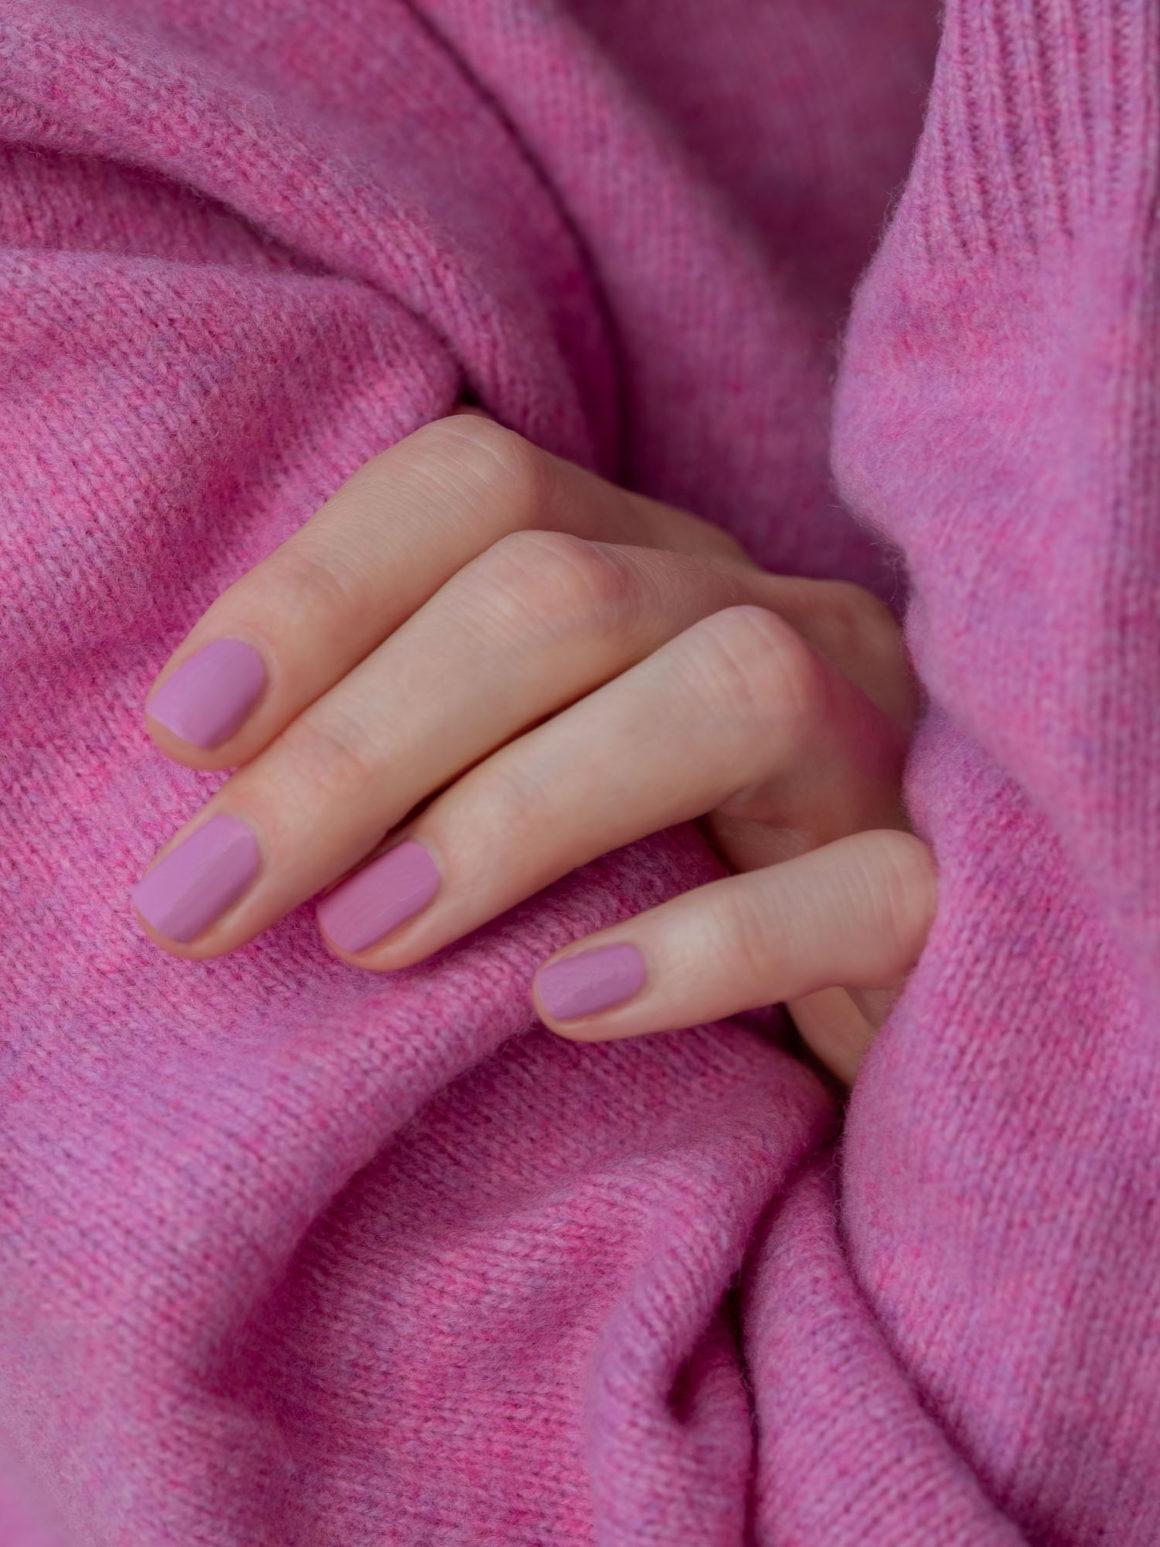 Beautyblog Bareminds Klassisch pinke Nägel 3